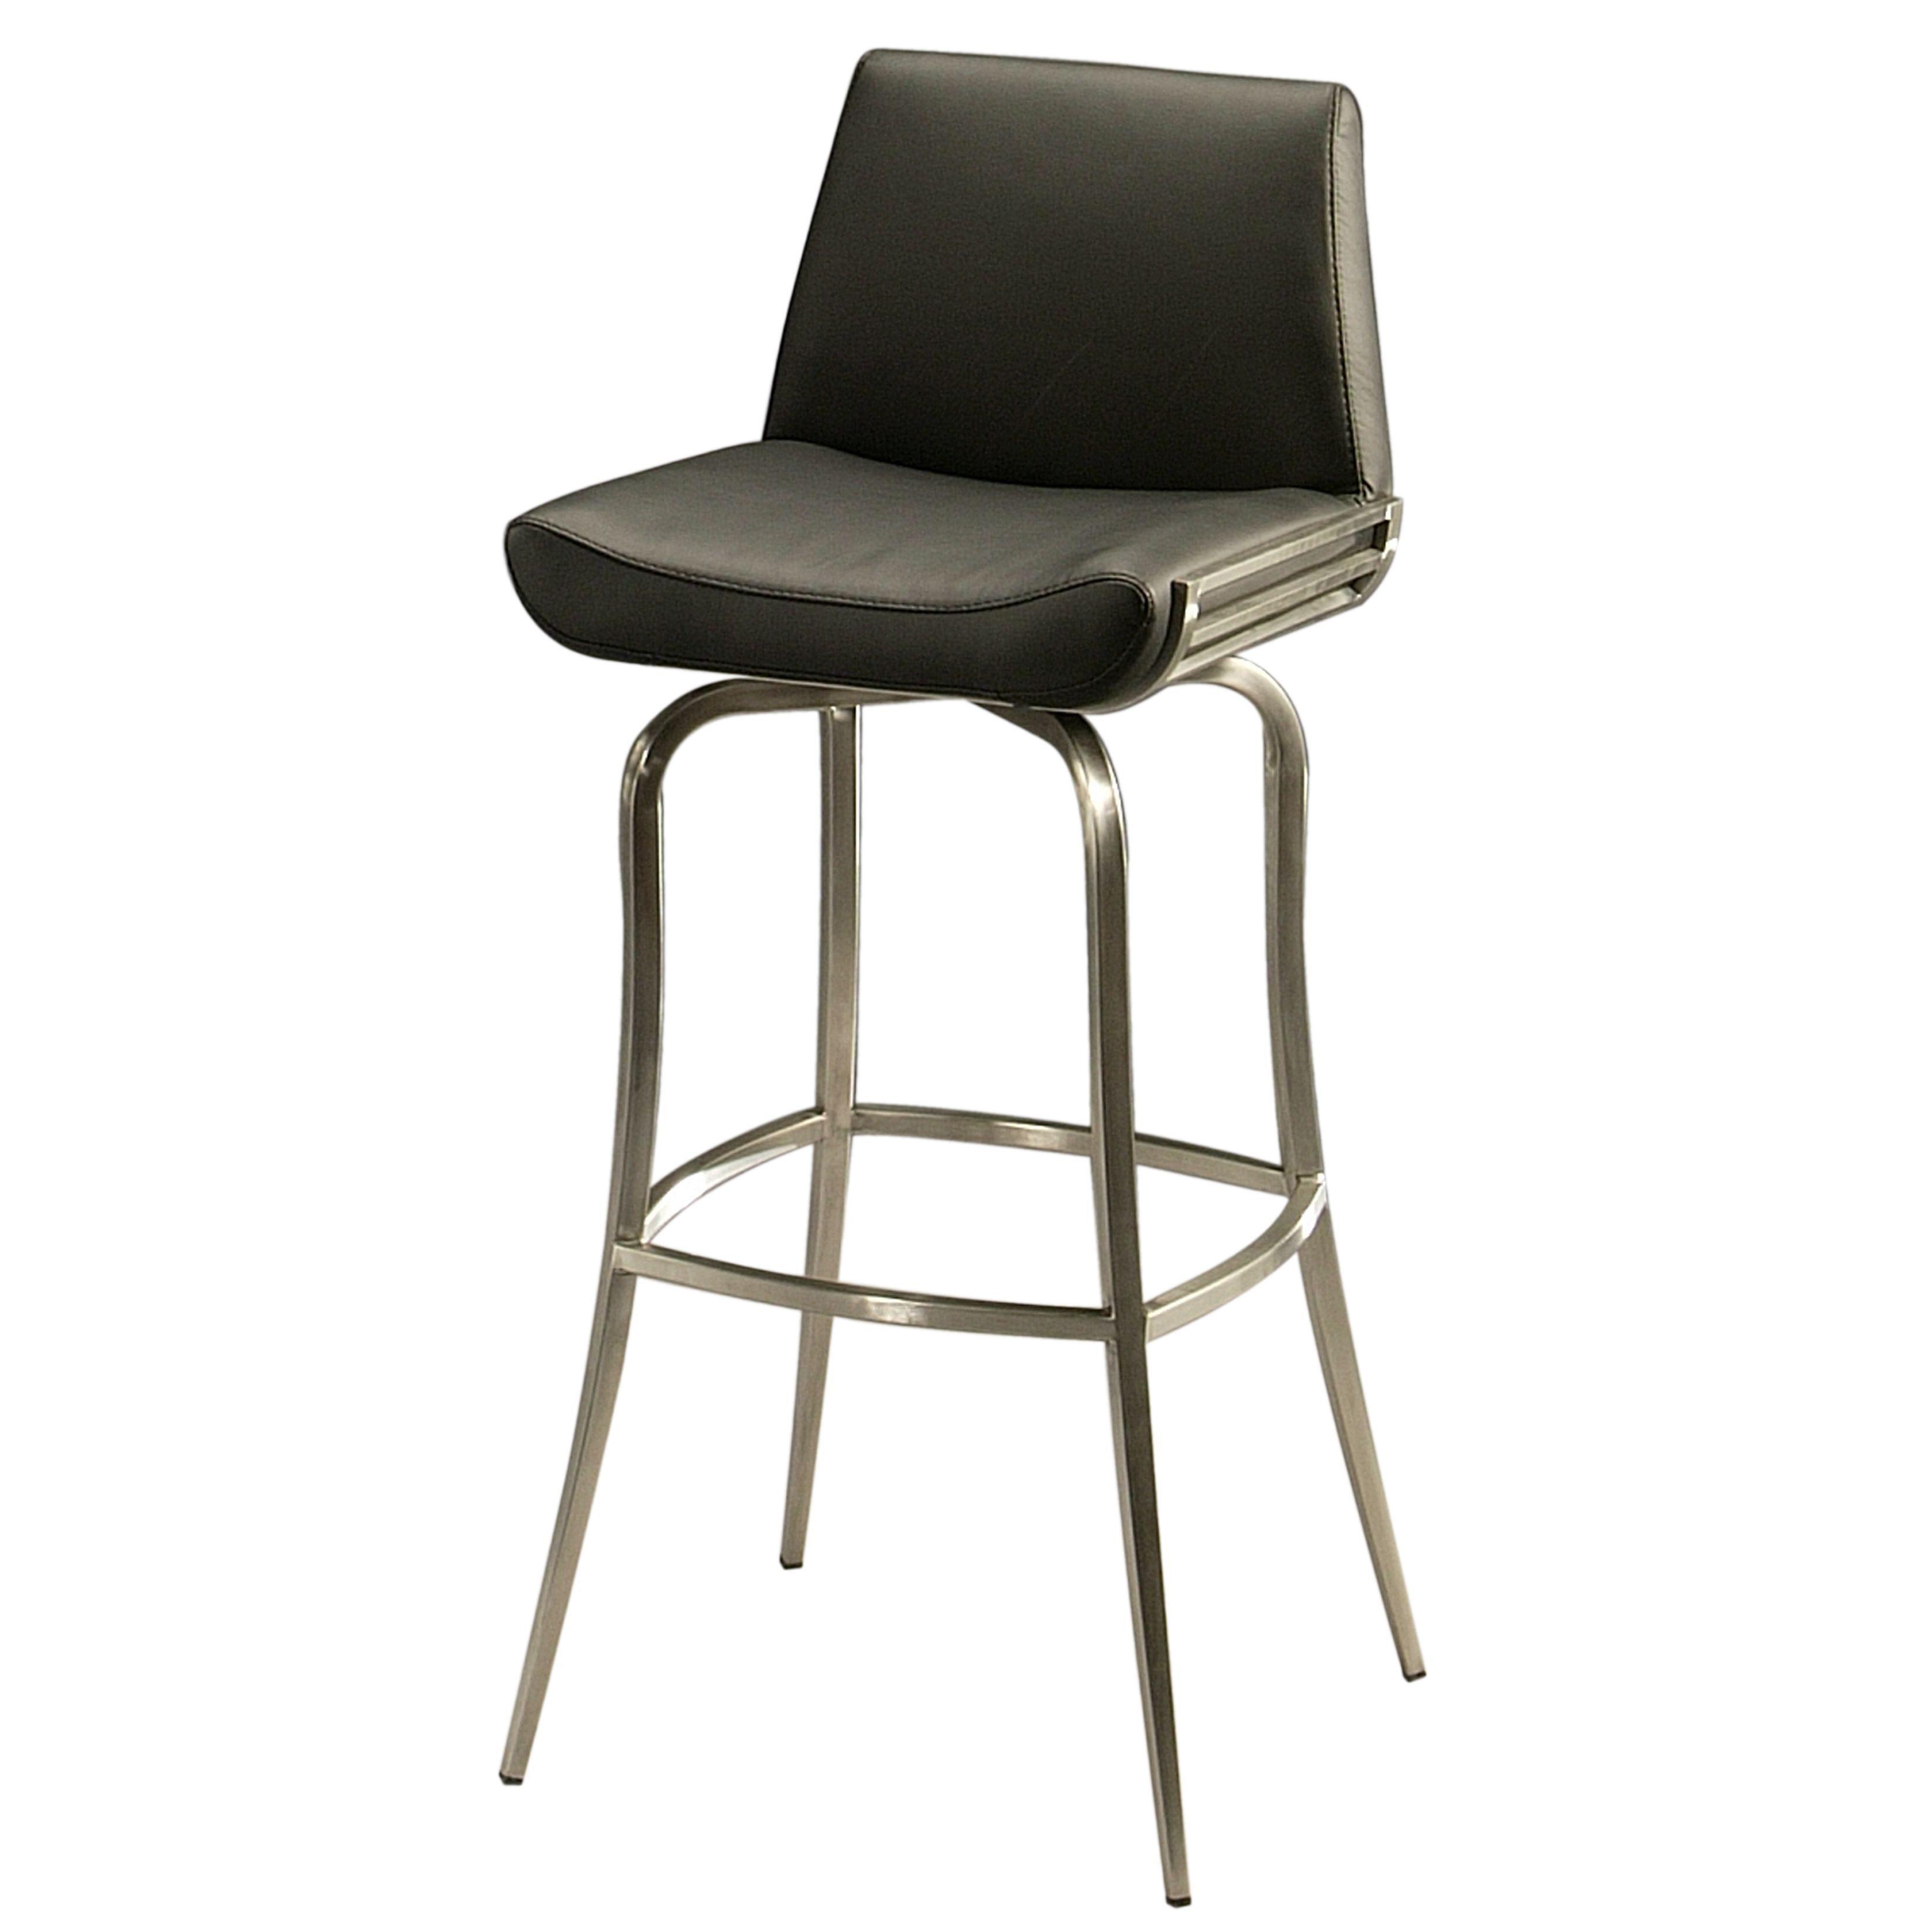 Marvelous Degorah Silver Black Stainless Steel Faux Leather Swivel Beatyapartments Chair Design Images Beatyapartmentscom